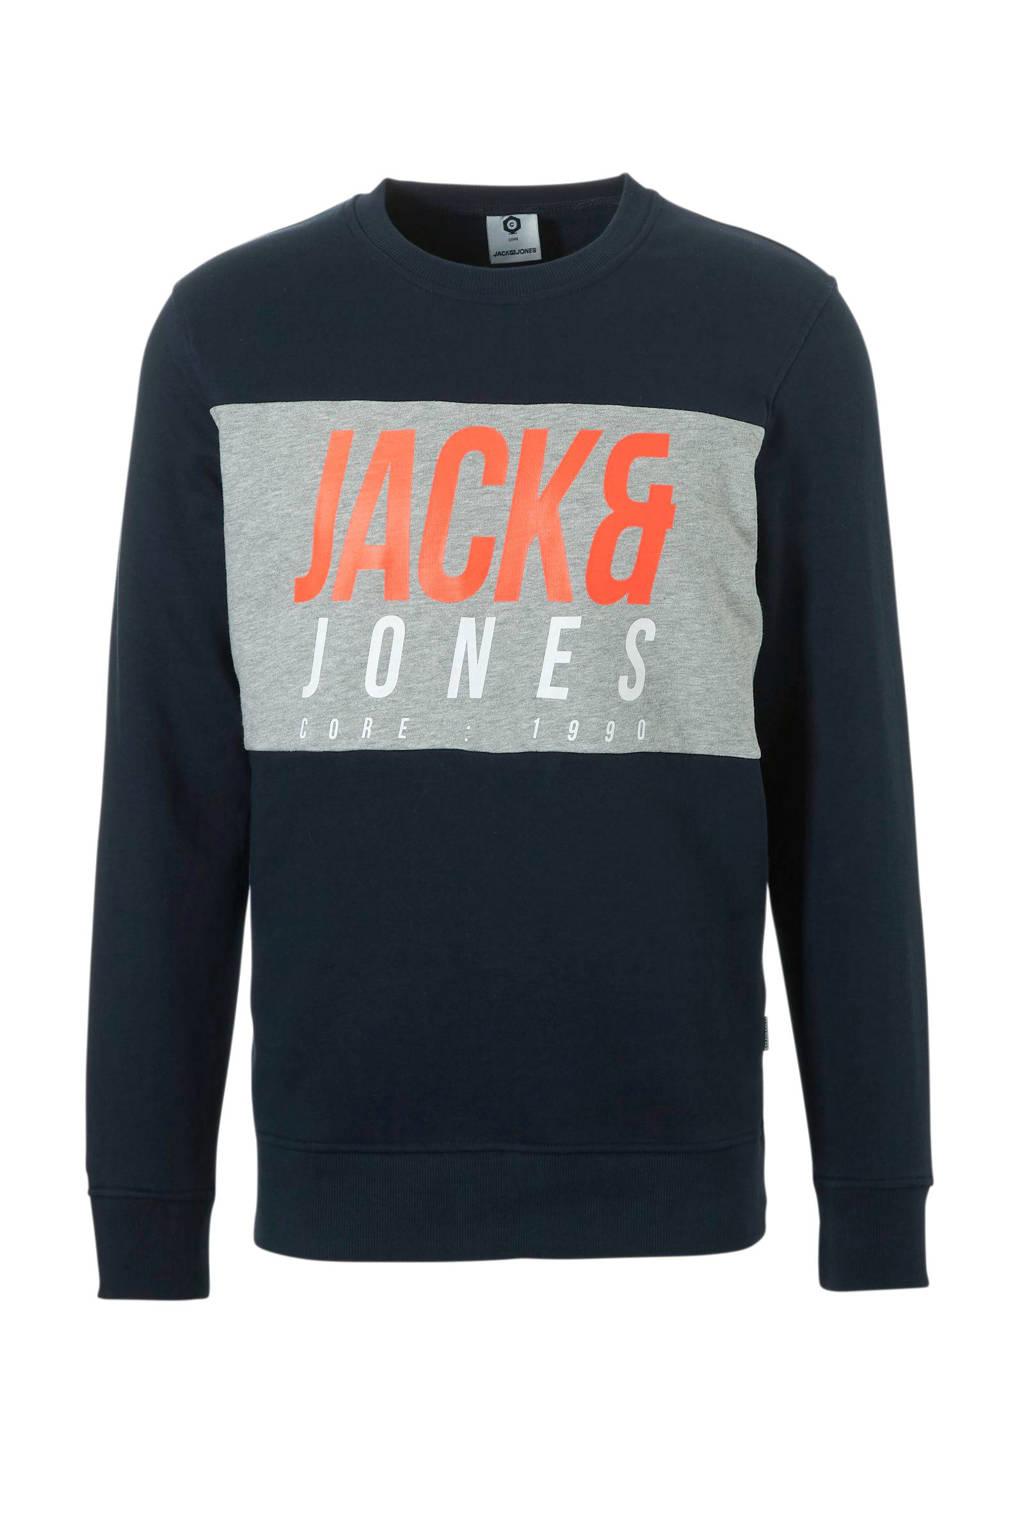 JACK & JONES CORE sweater, Donkerblauw